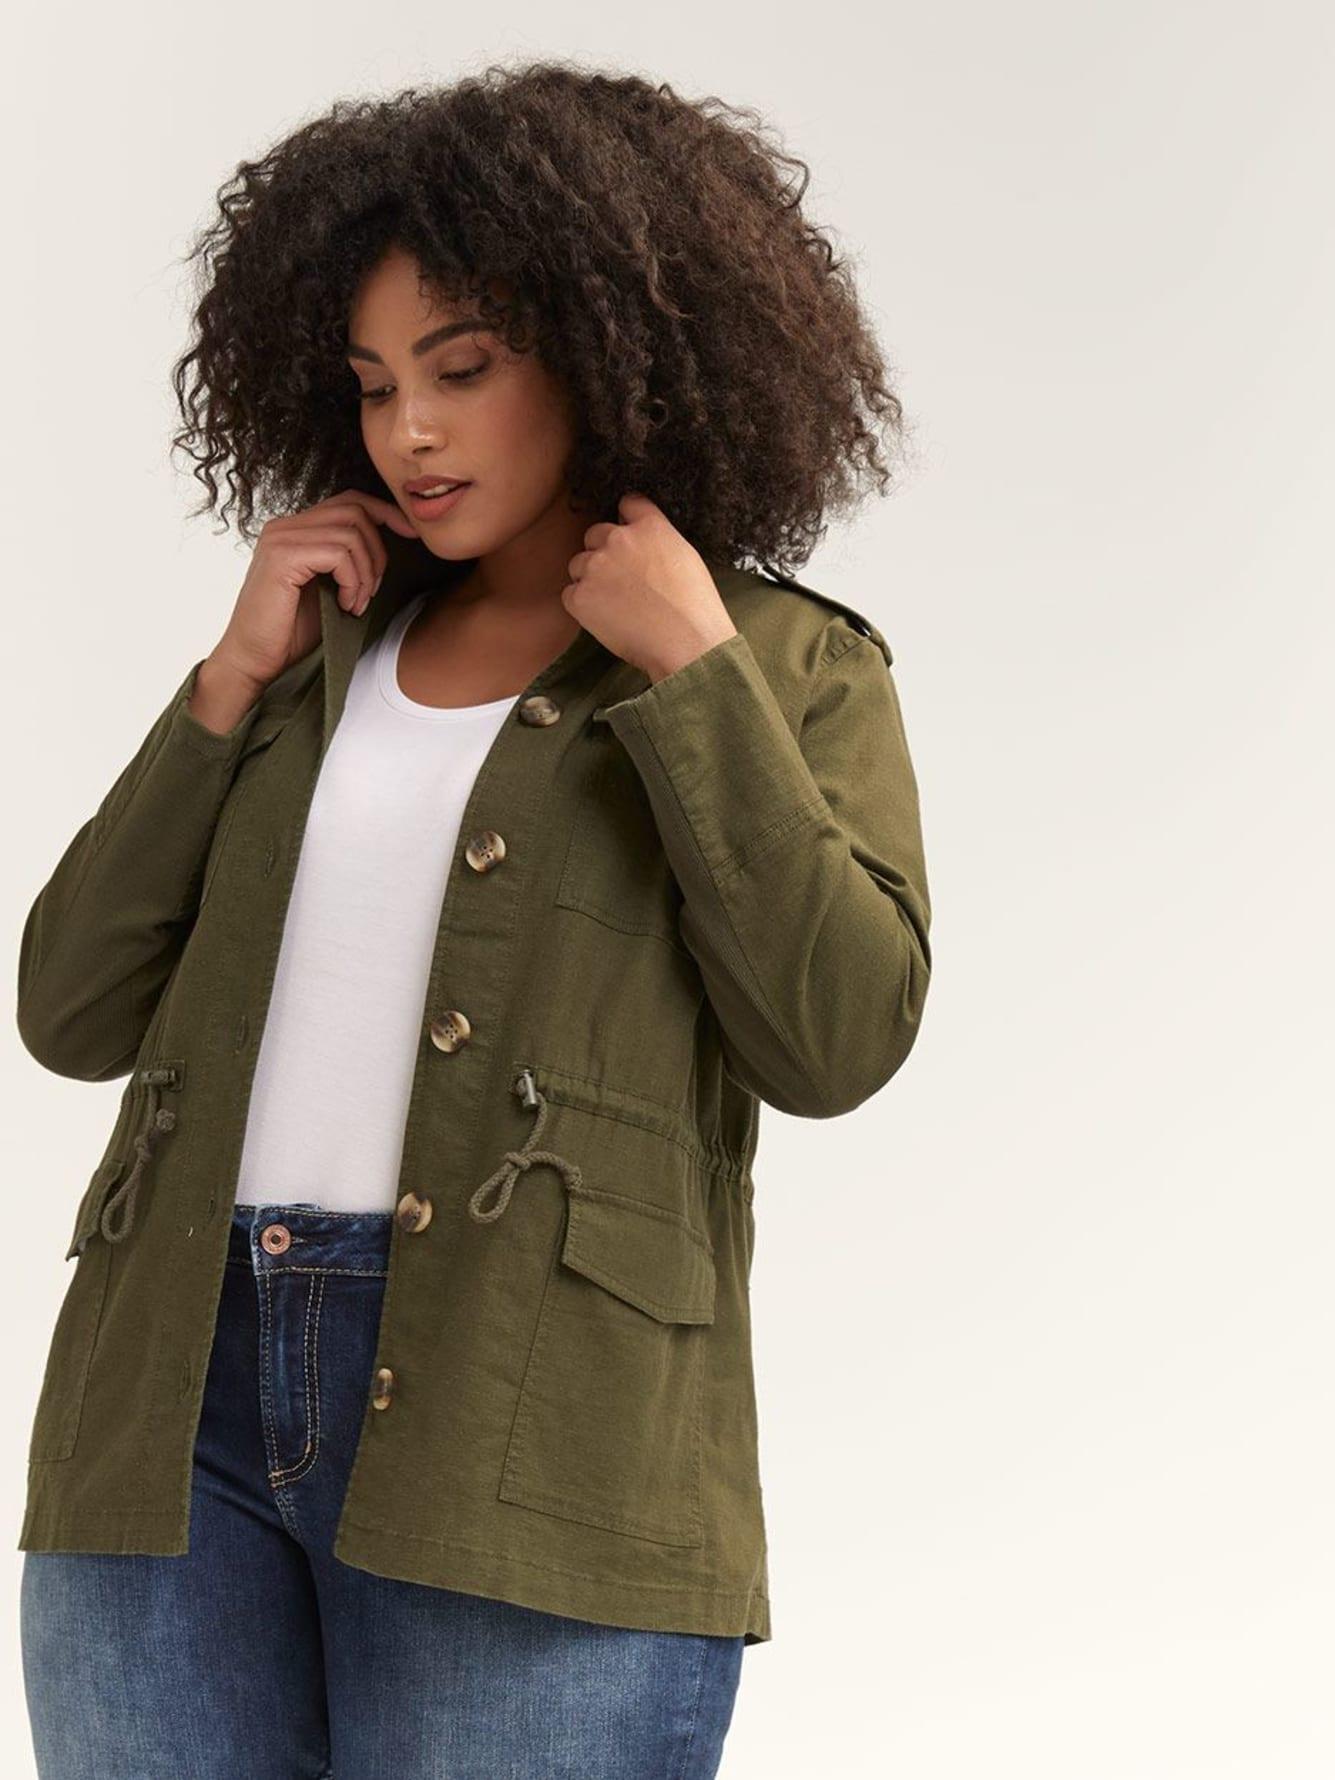 Linen Utility Jacket by Penningtons